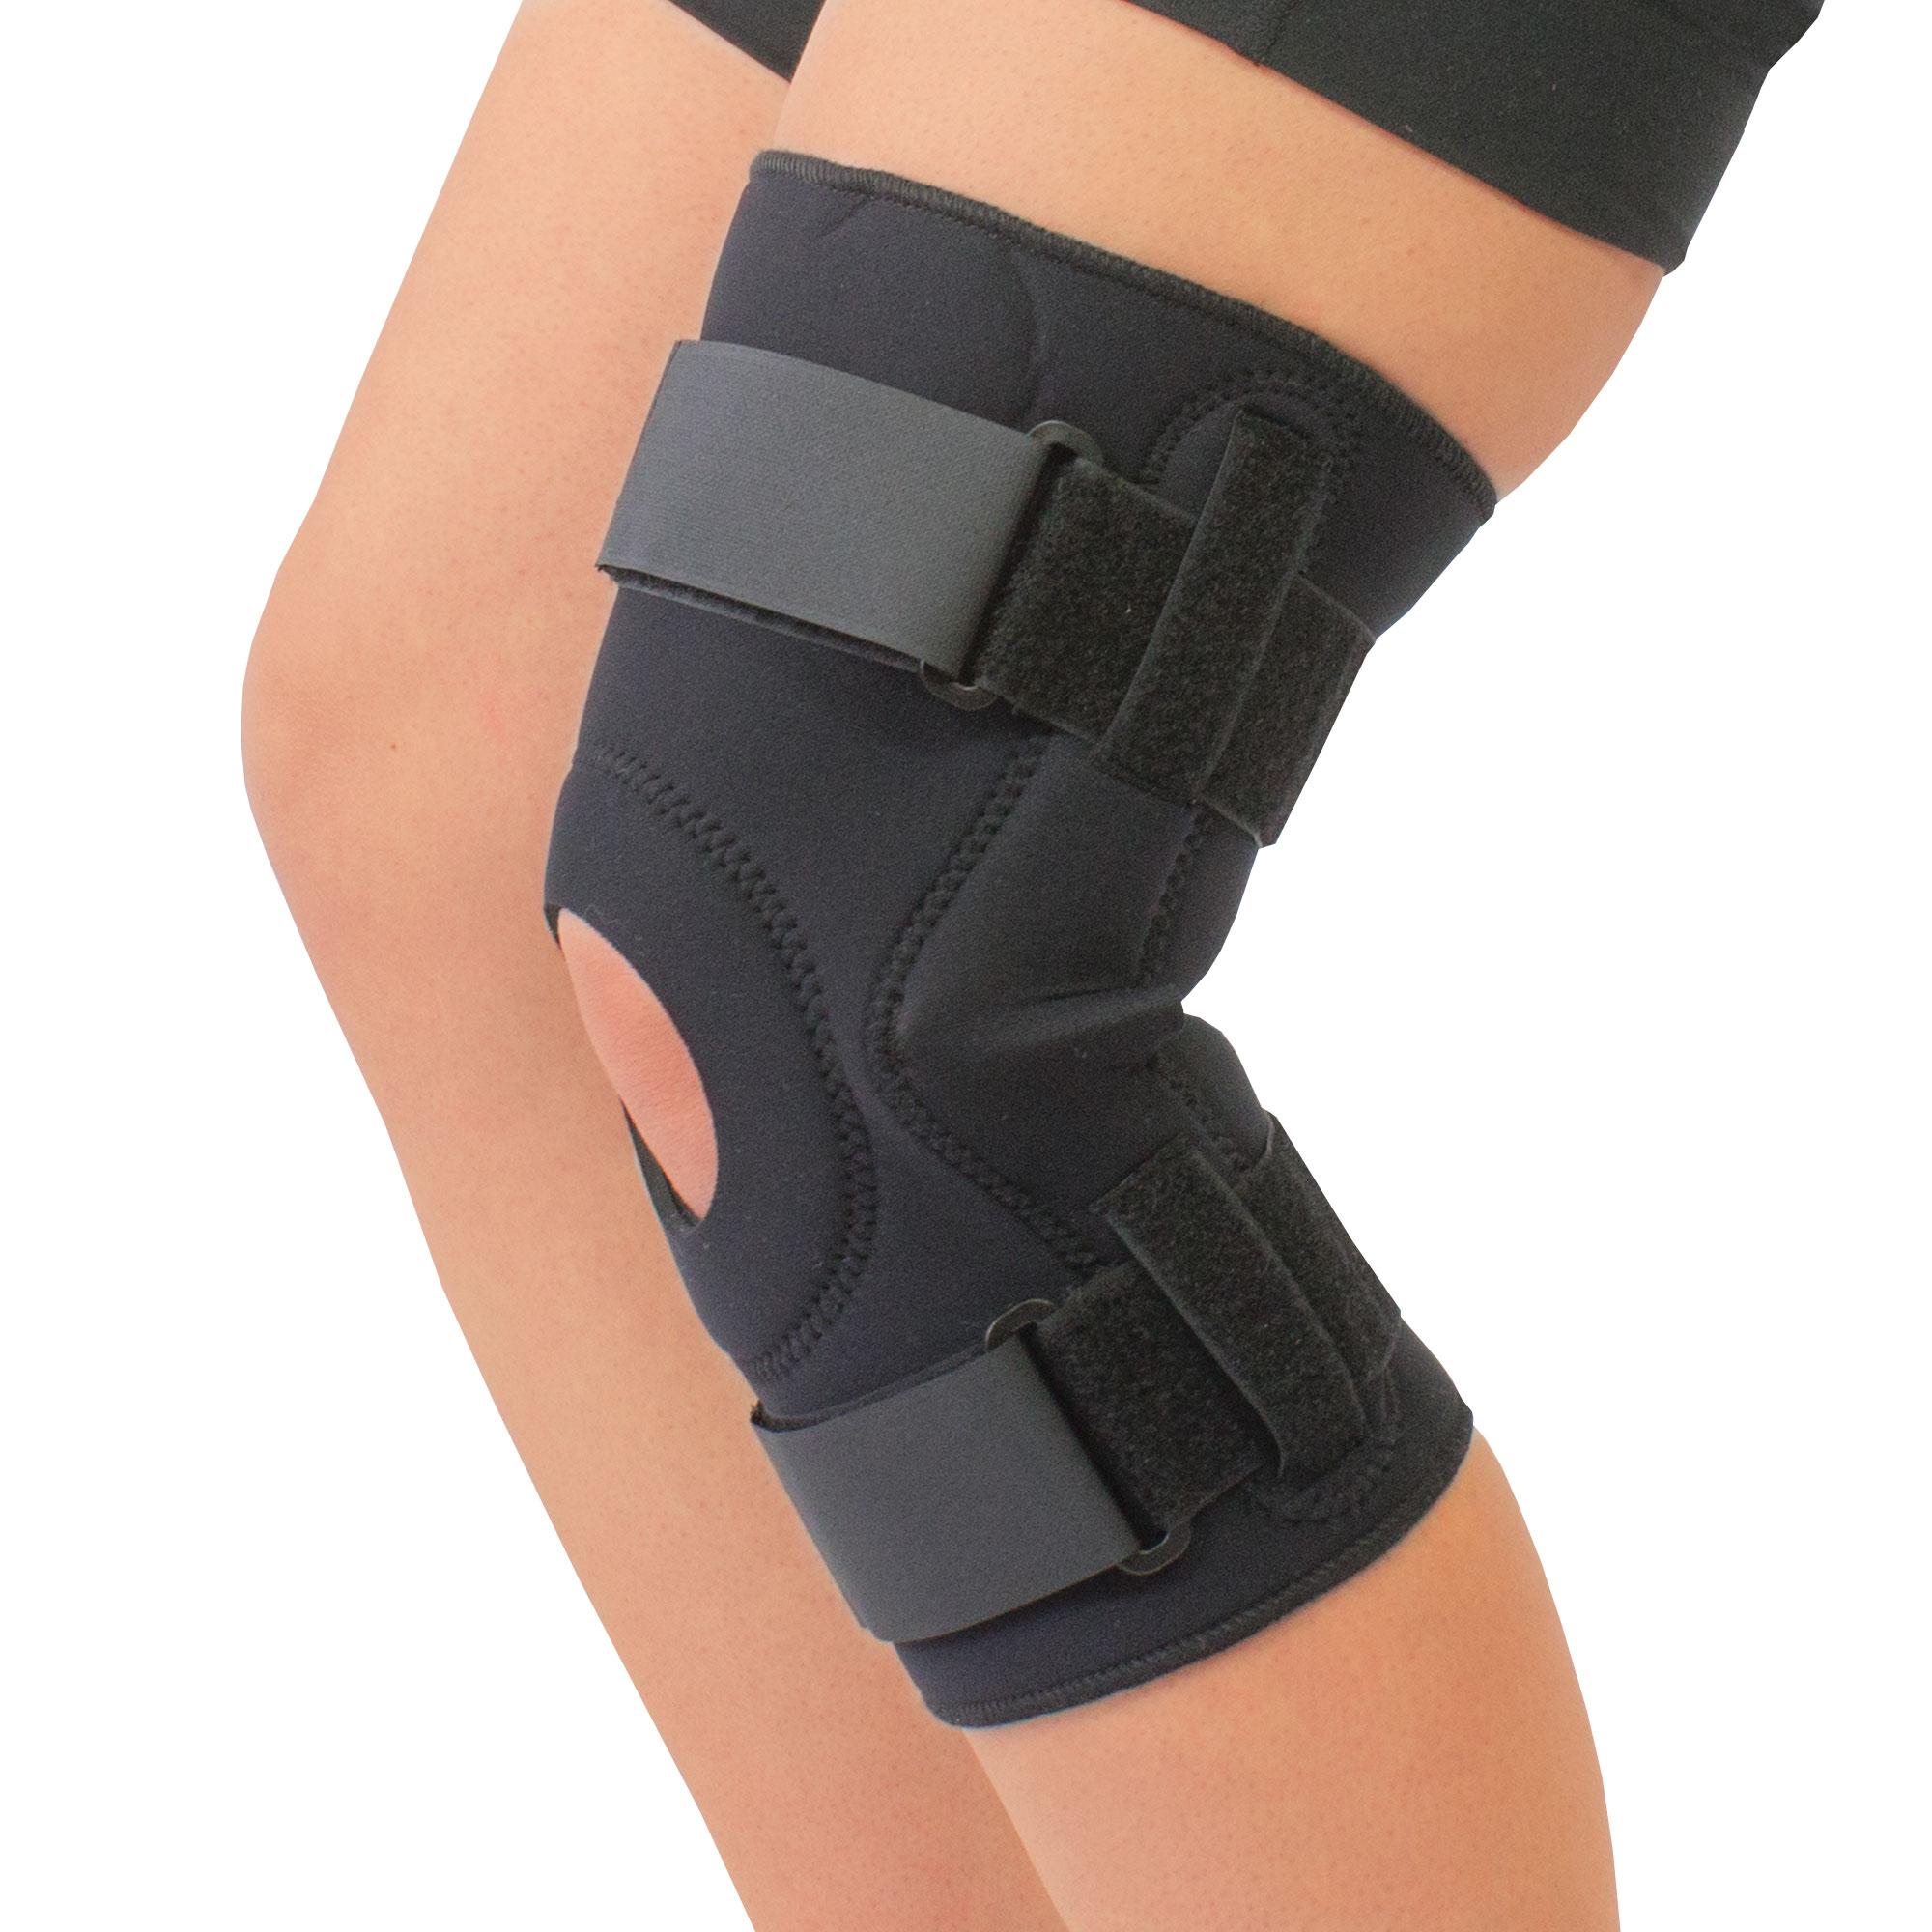 black-hyperextension-knee-brace.jpg